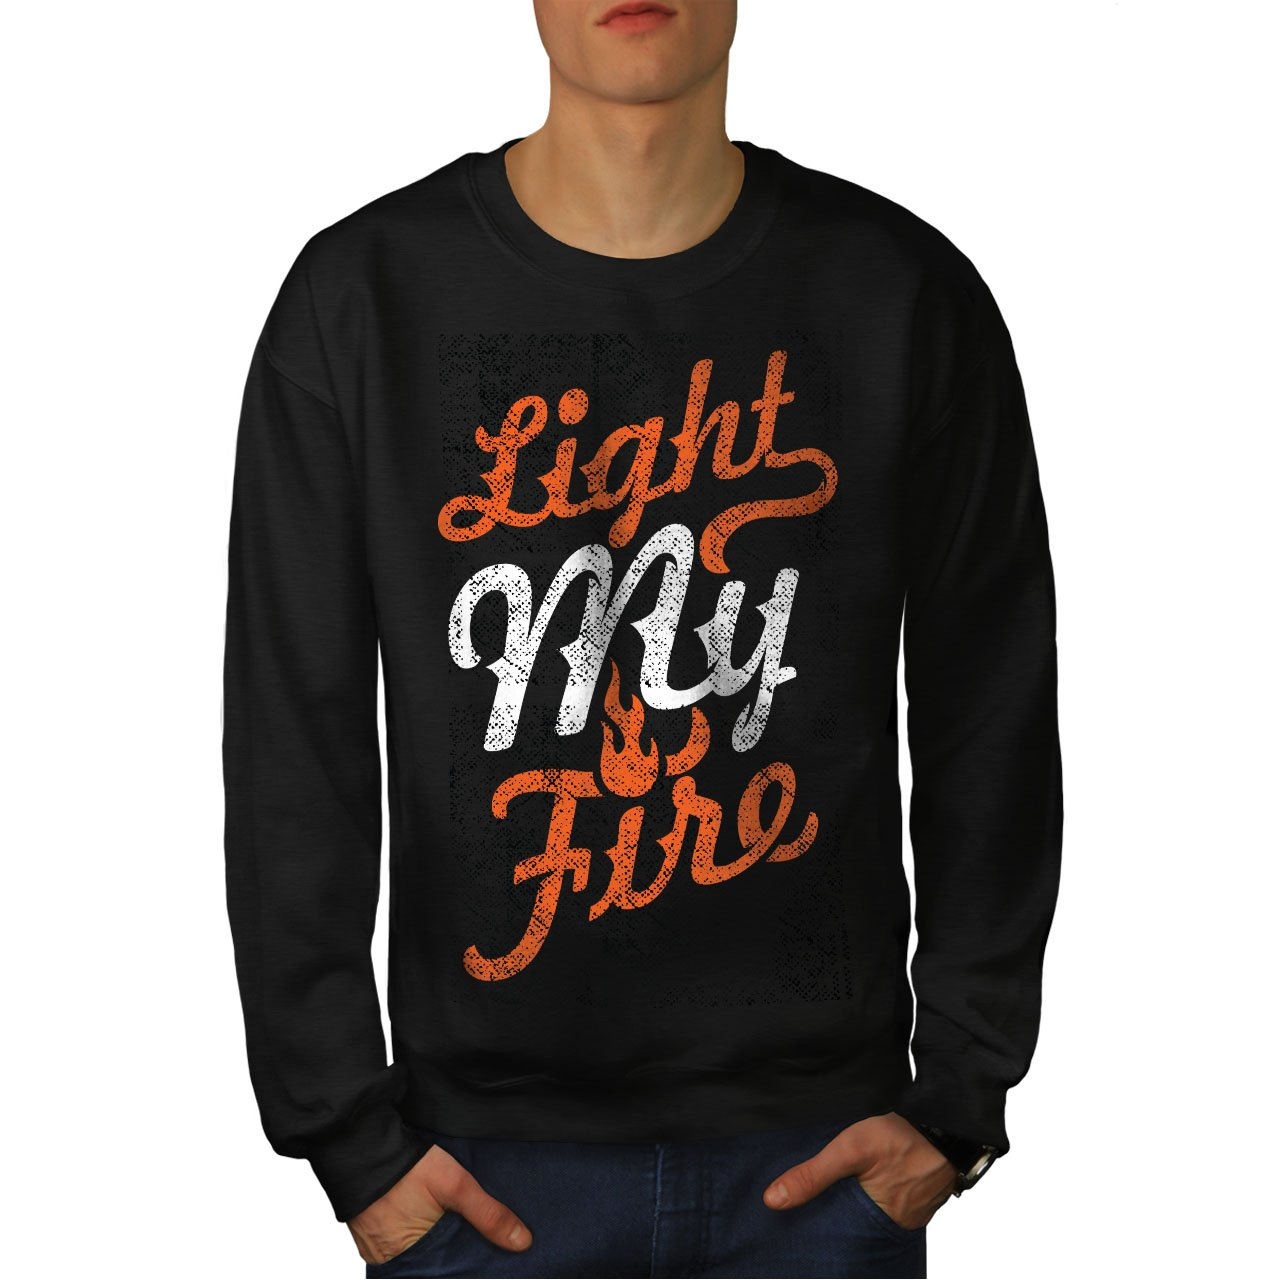 Flame Casual Jumper wellcoda Light My Fire Text Mens Sweatshirt